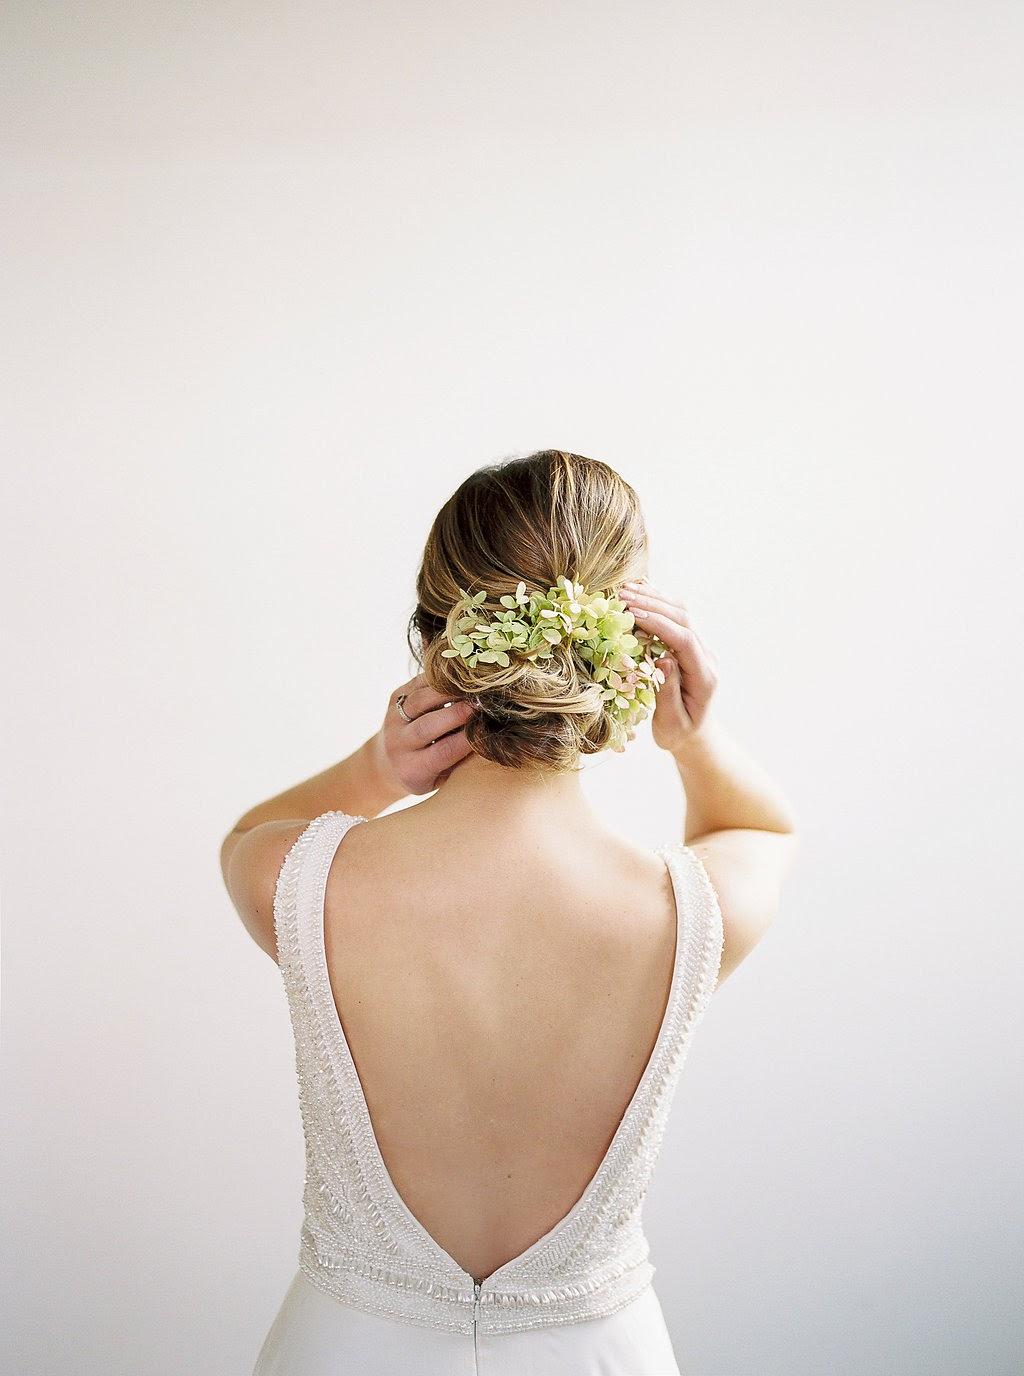 Alexandra-Elise-Photography-Ali-Reed-Film-Wedding-Photographer-140.jpg